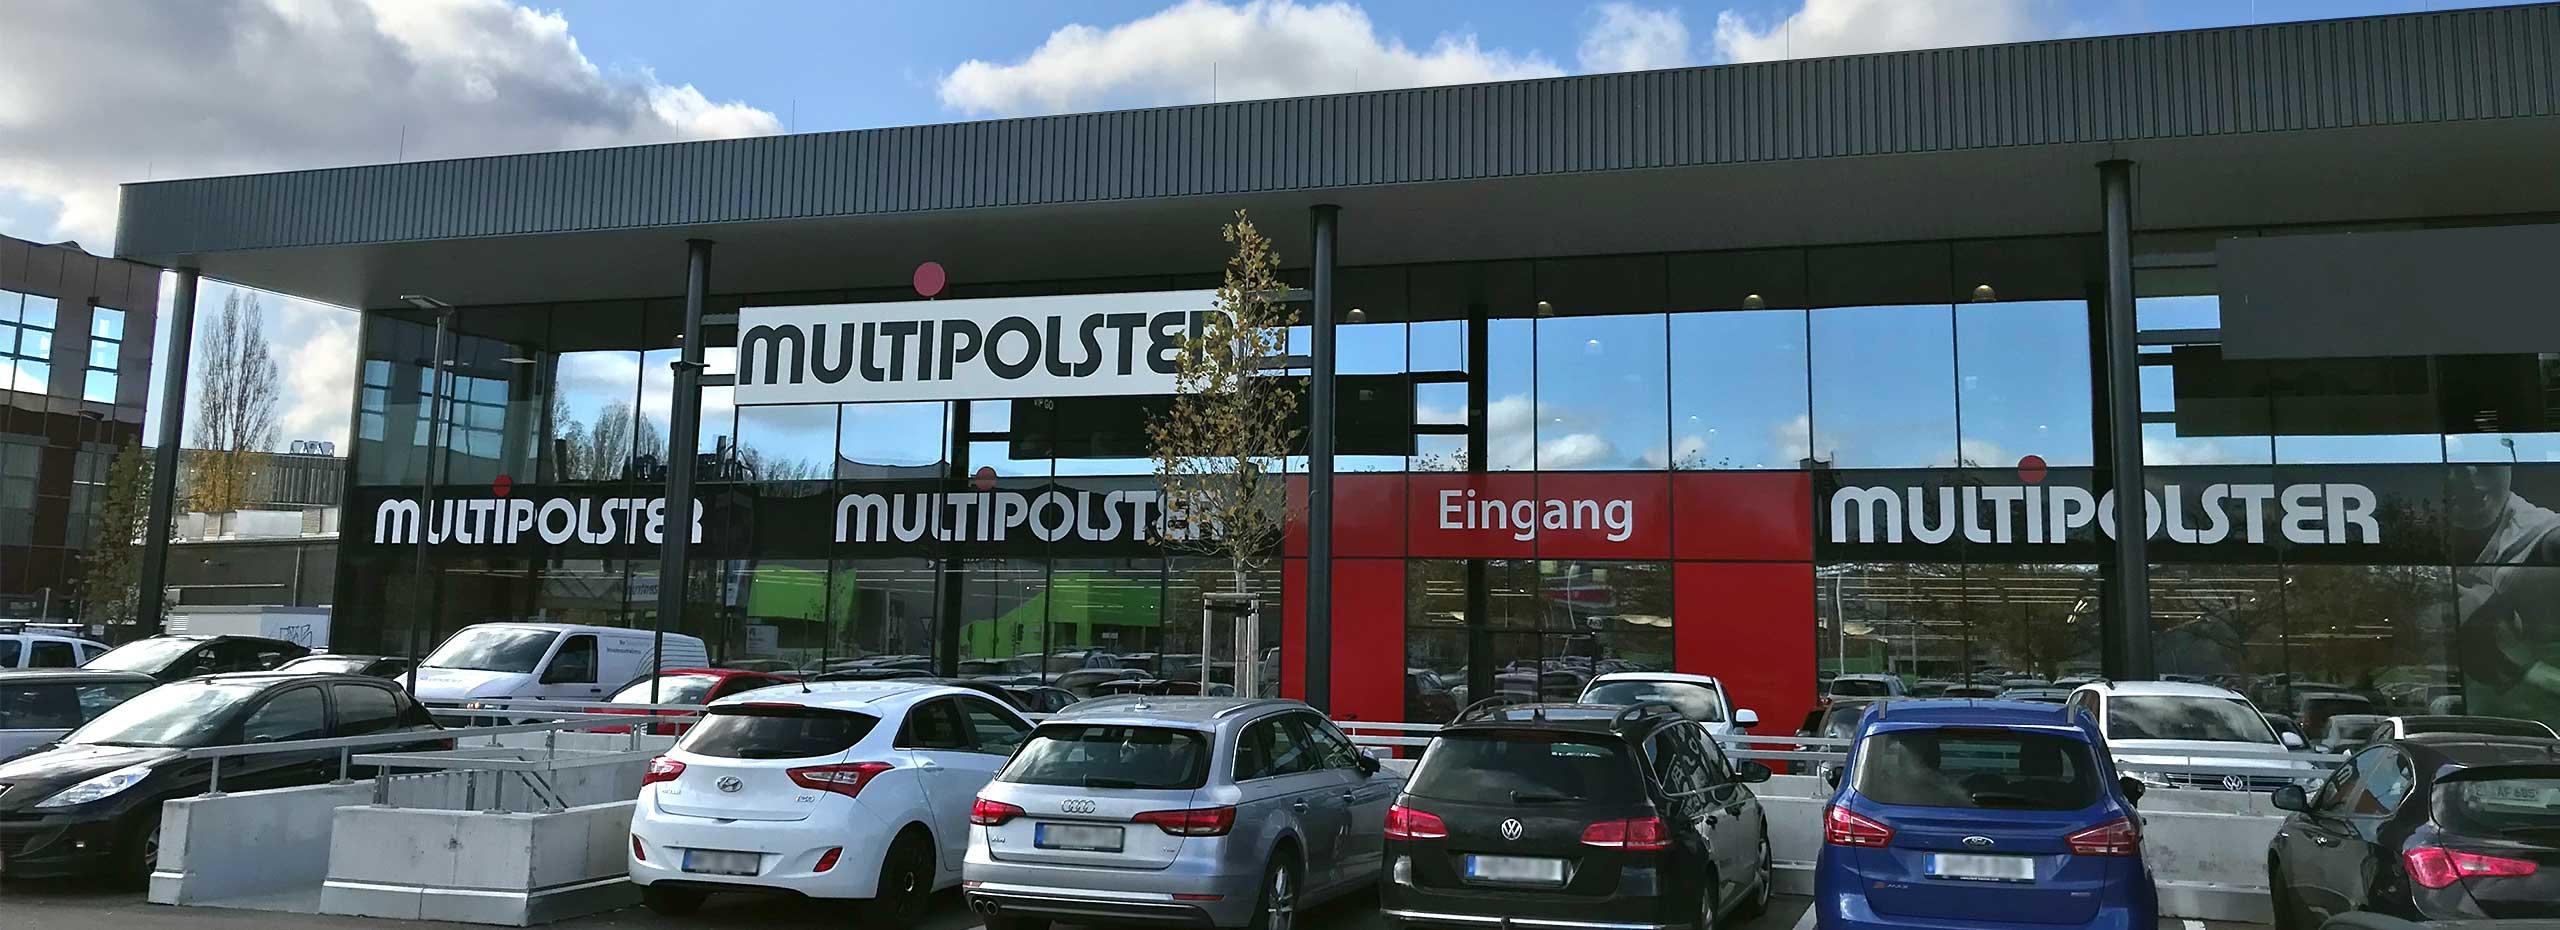 Multipolster - Ingolstadt